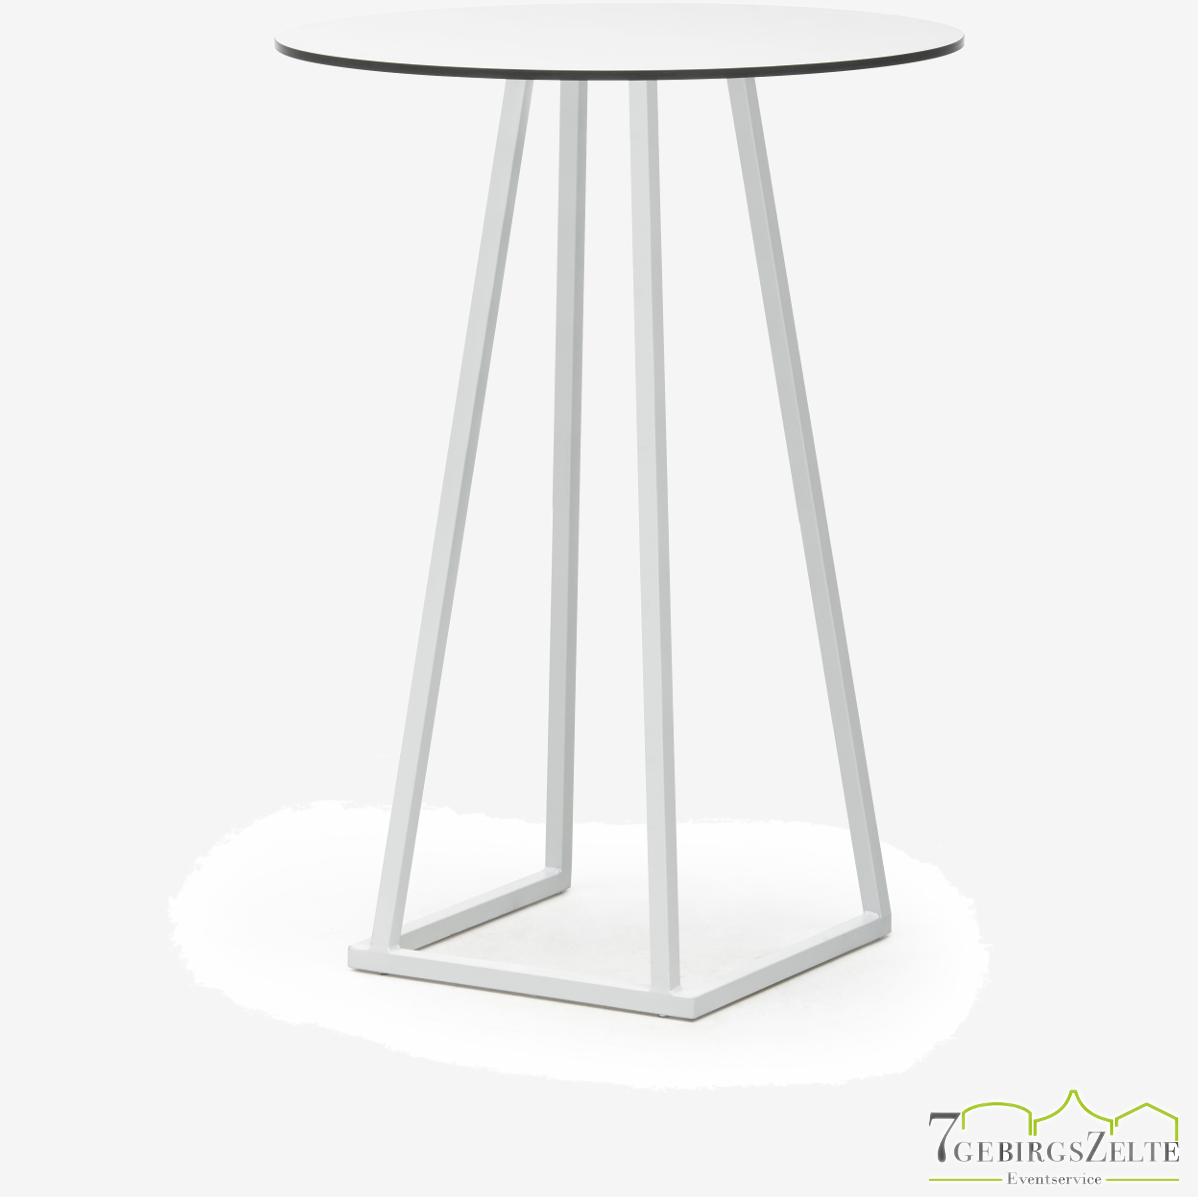 Linéa Party Round D80 x 110cm - alu weiß  - top compact weiß